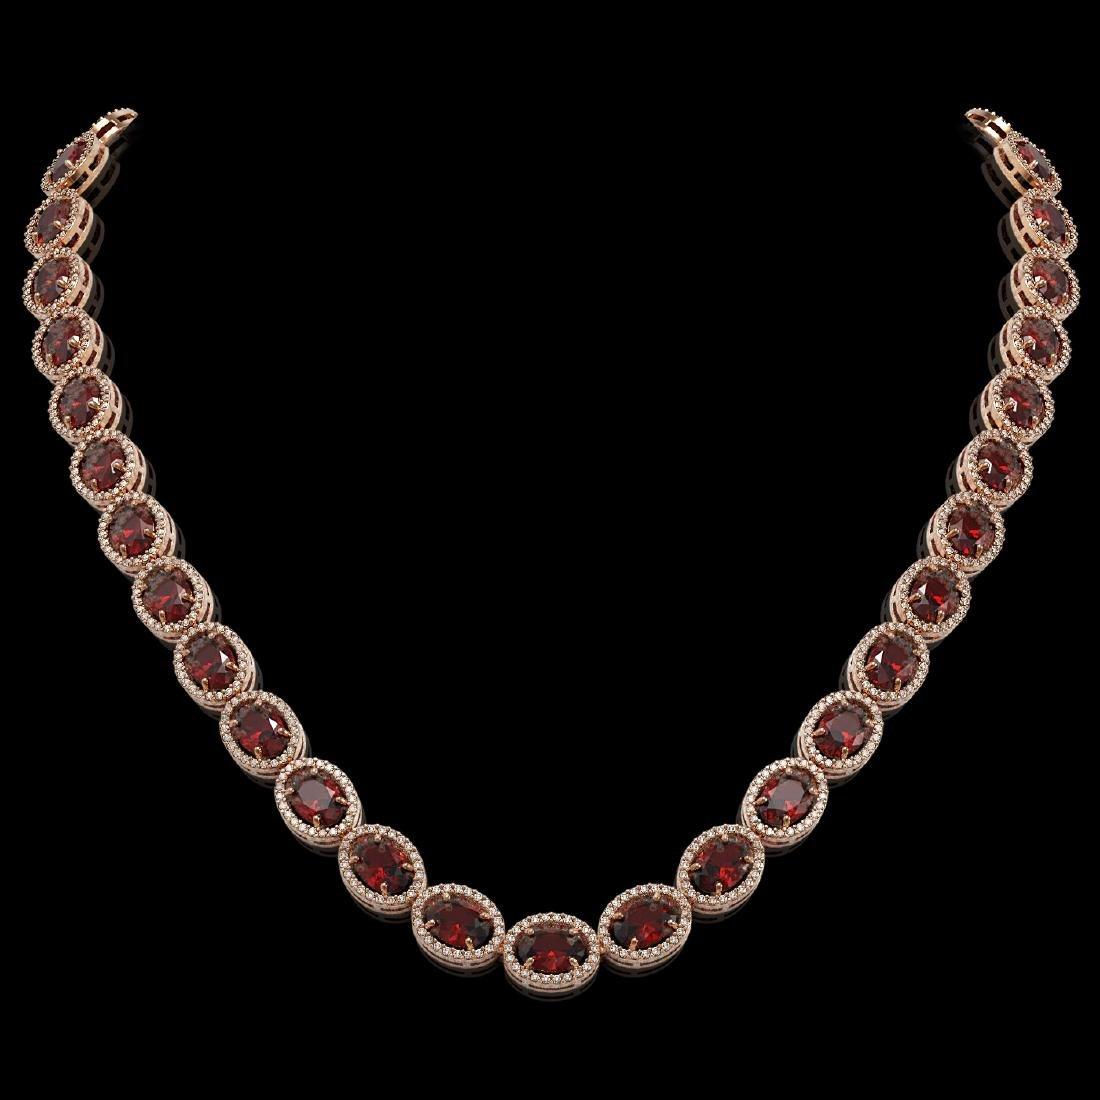 50.08 CTW Garnet & Diamond Halo Necklace 10K Rose Gold